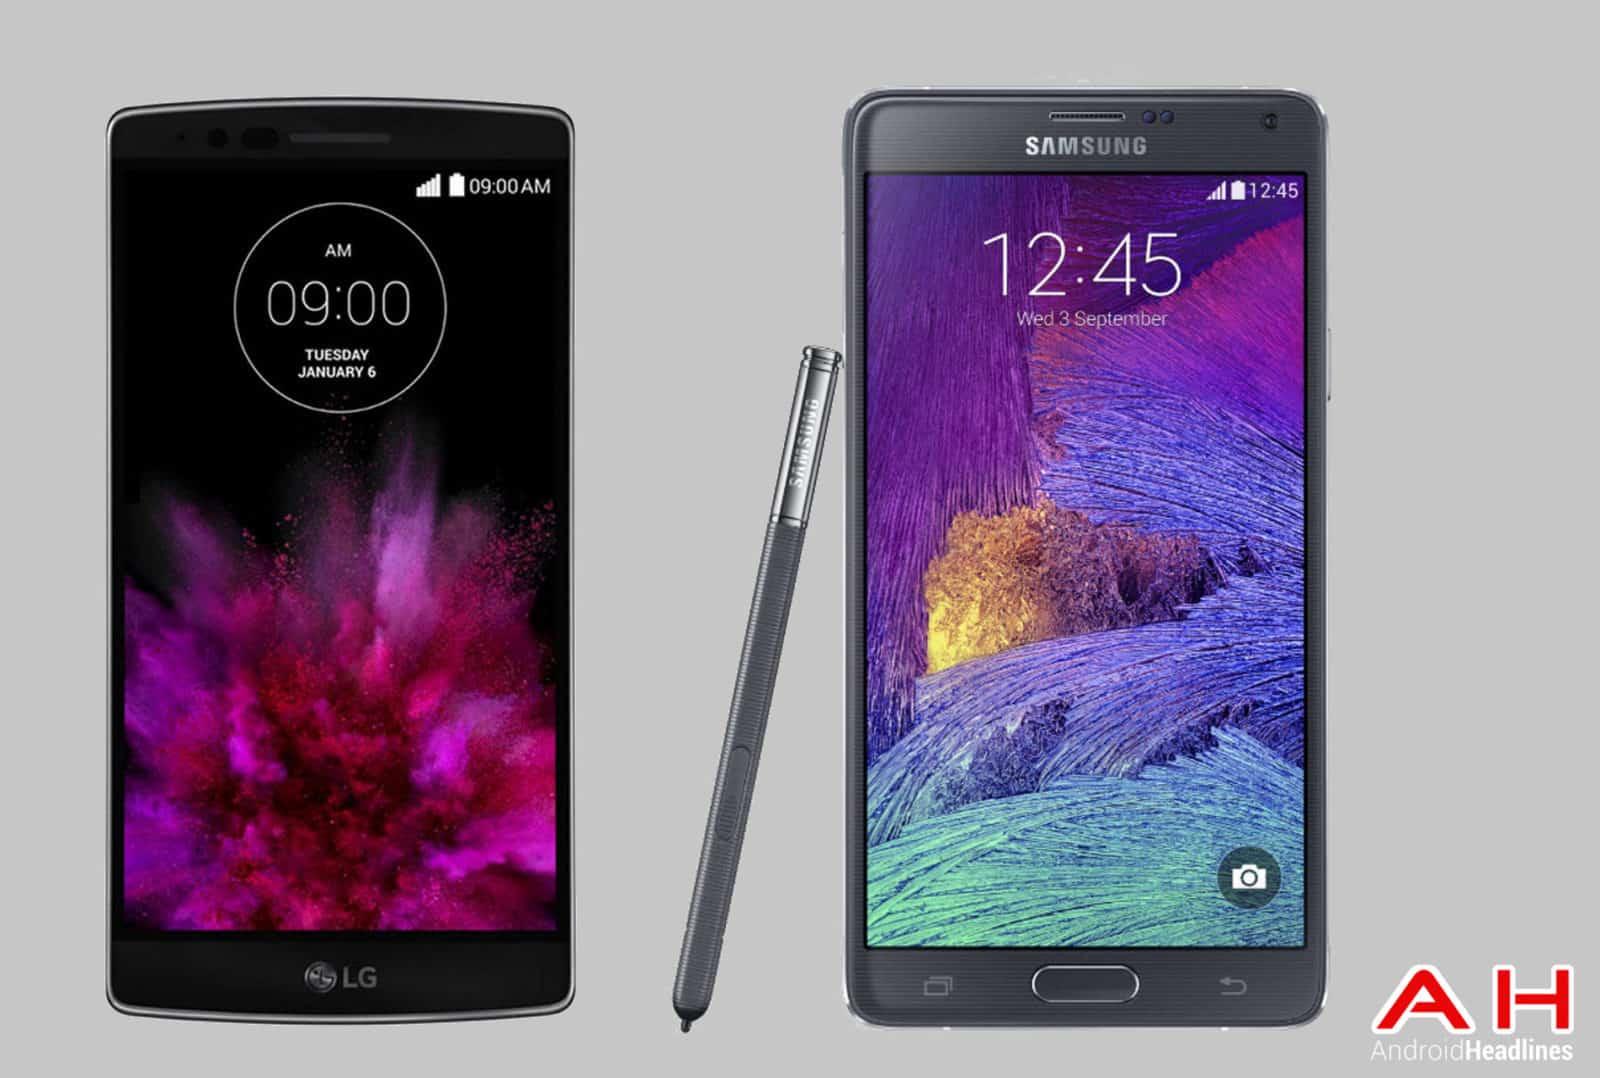 LG G Flex 2 vs Galaxy Note 4 cam AH